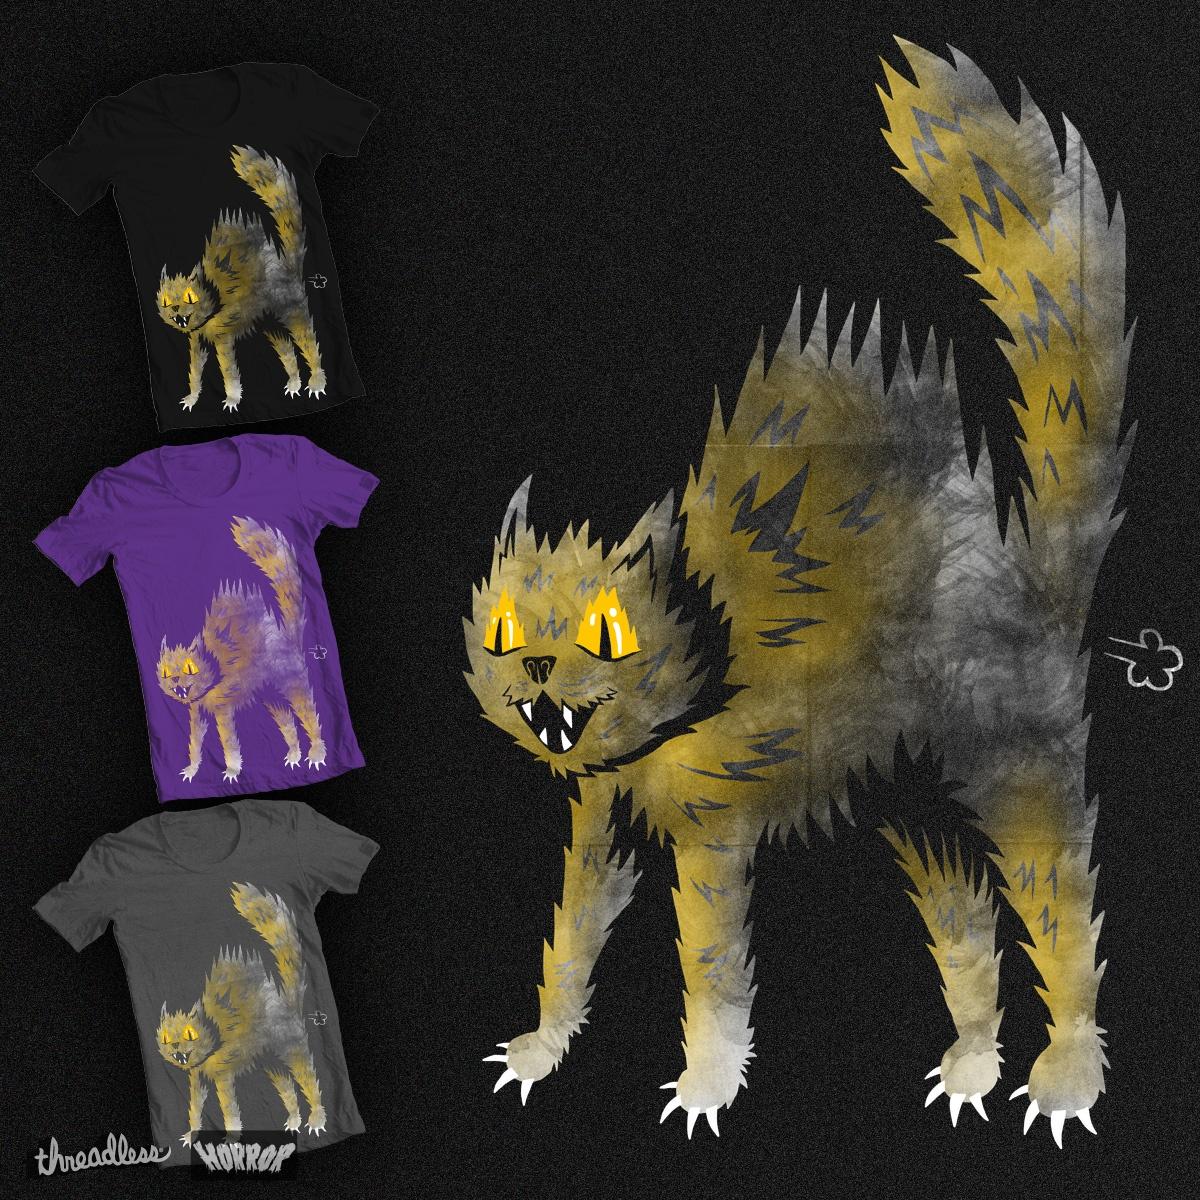 Scaredy Cat by Jaxxer on Threadless